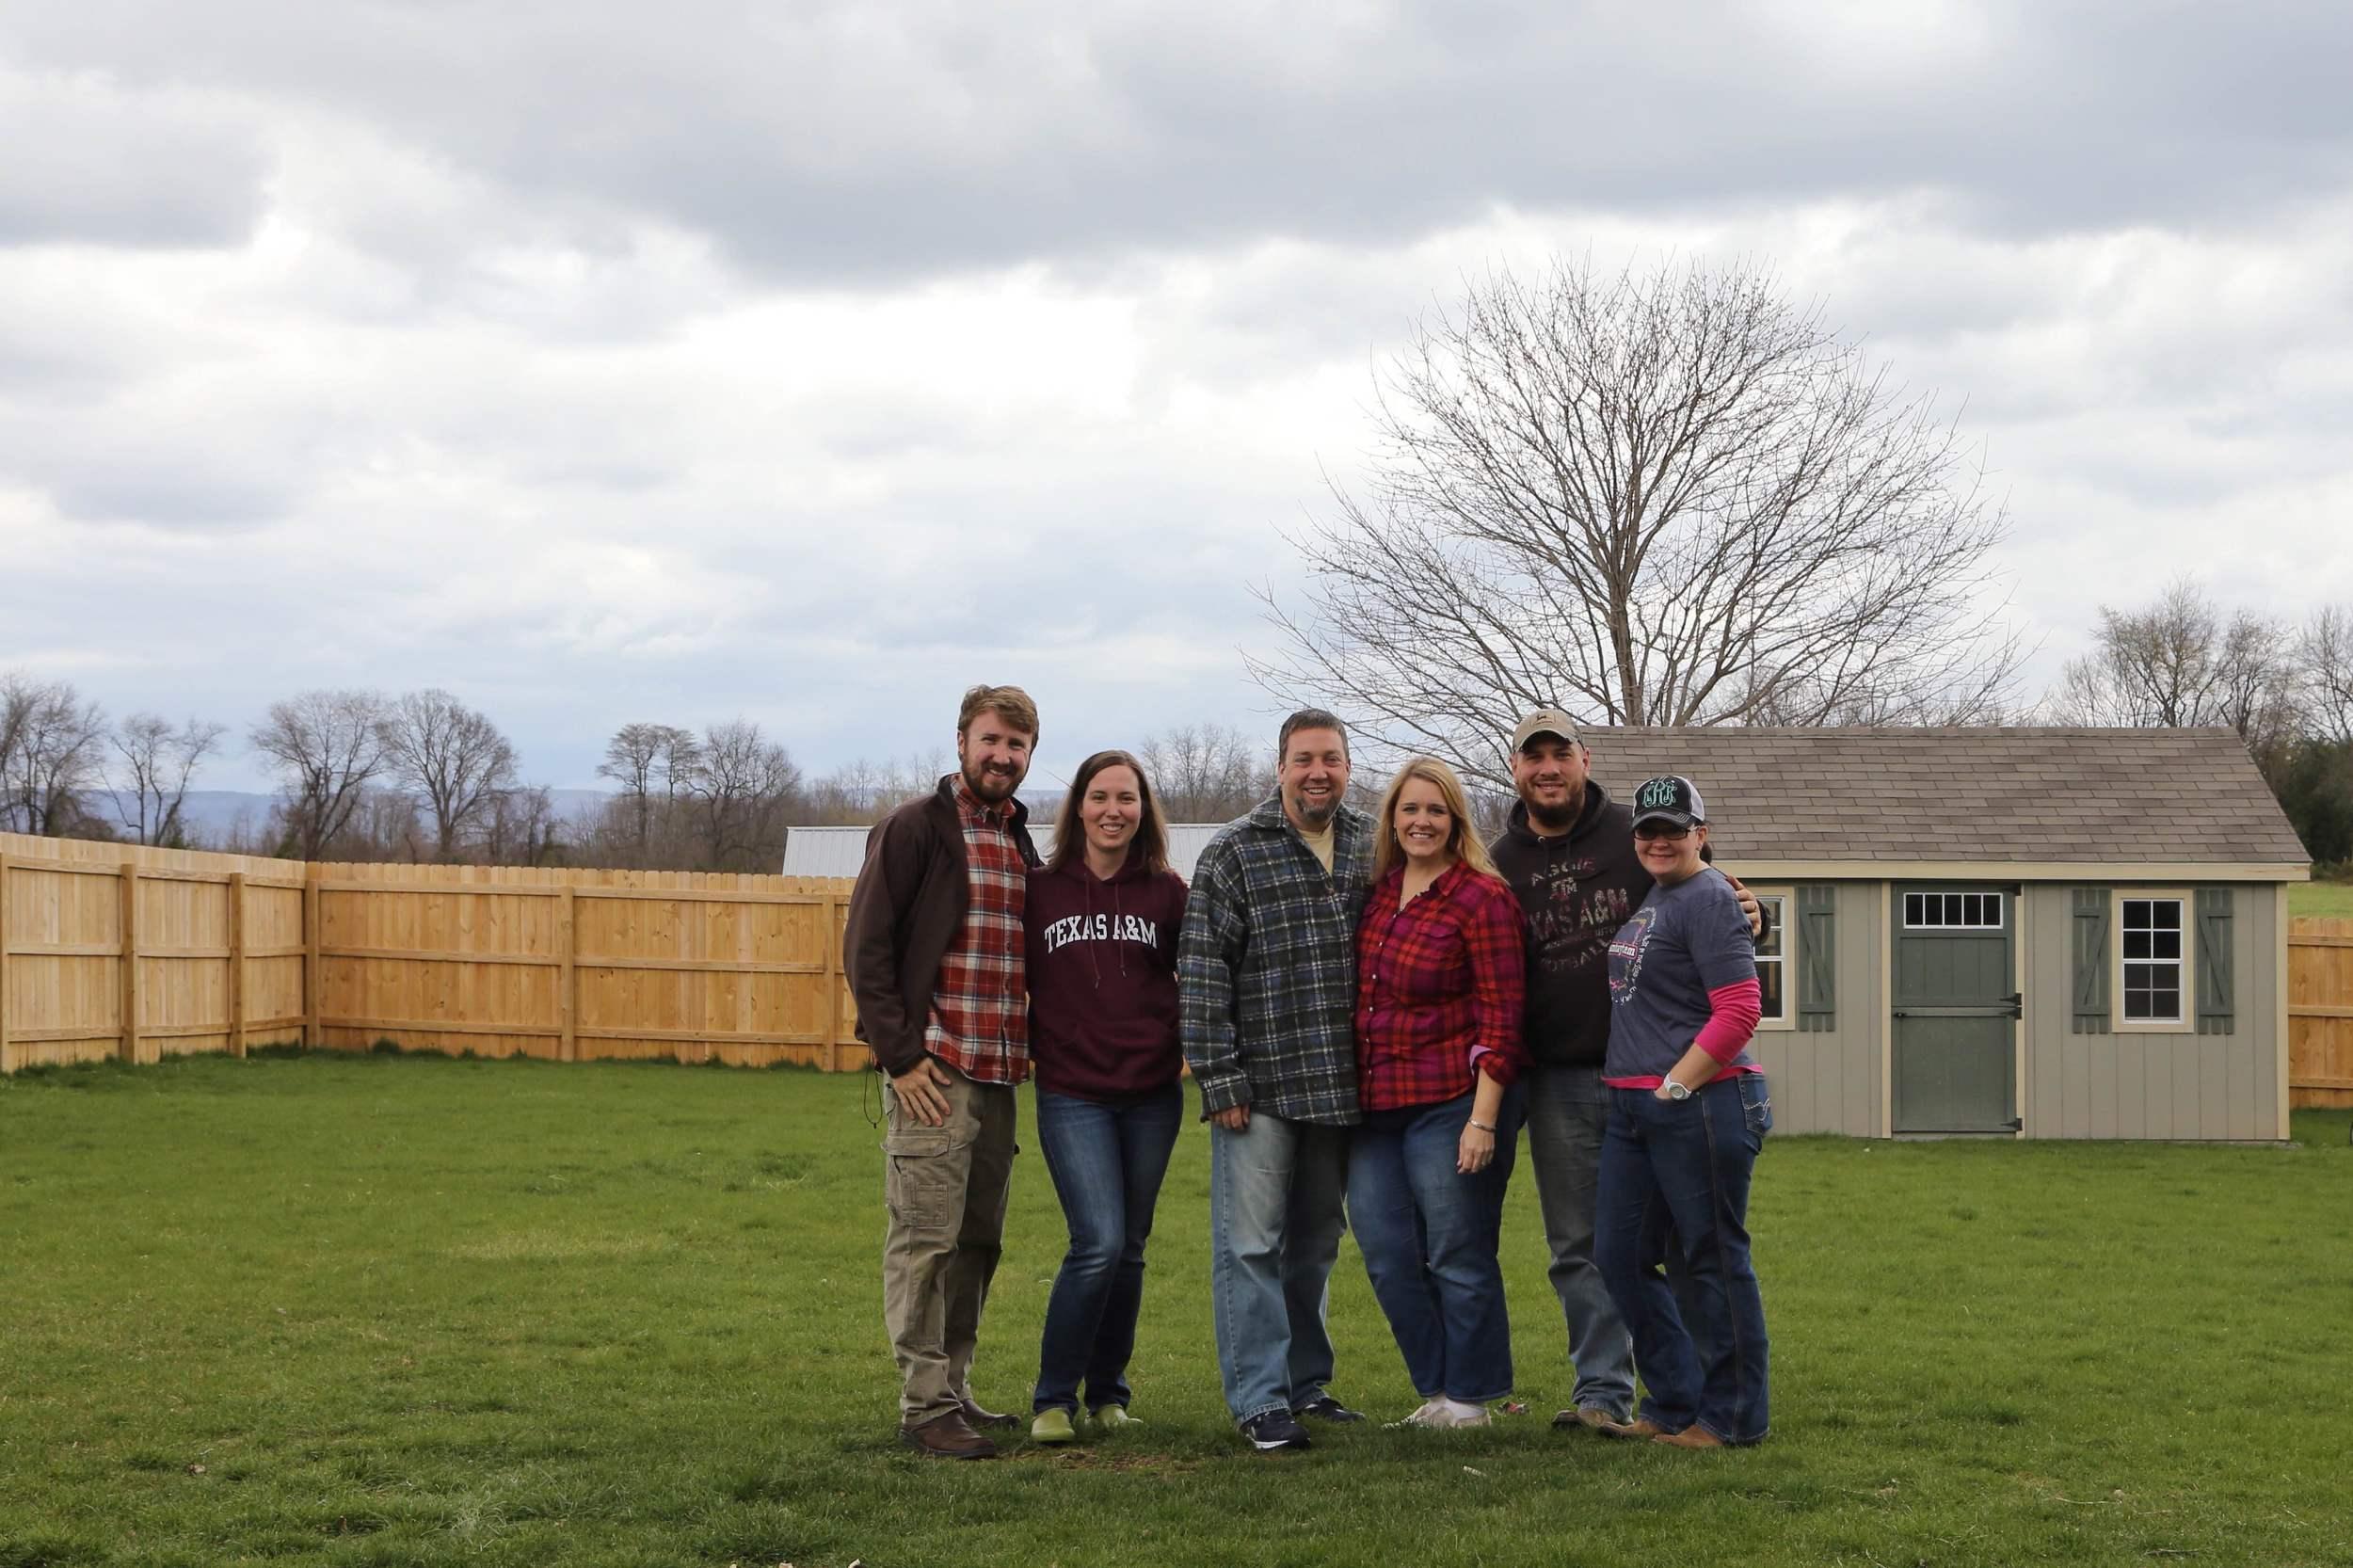 Kat and I along with Chris, Tori, Garrett, and Kari from  Family Life Church of Cypress